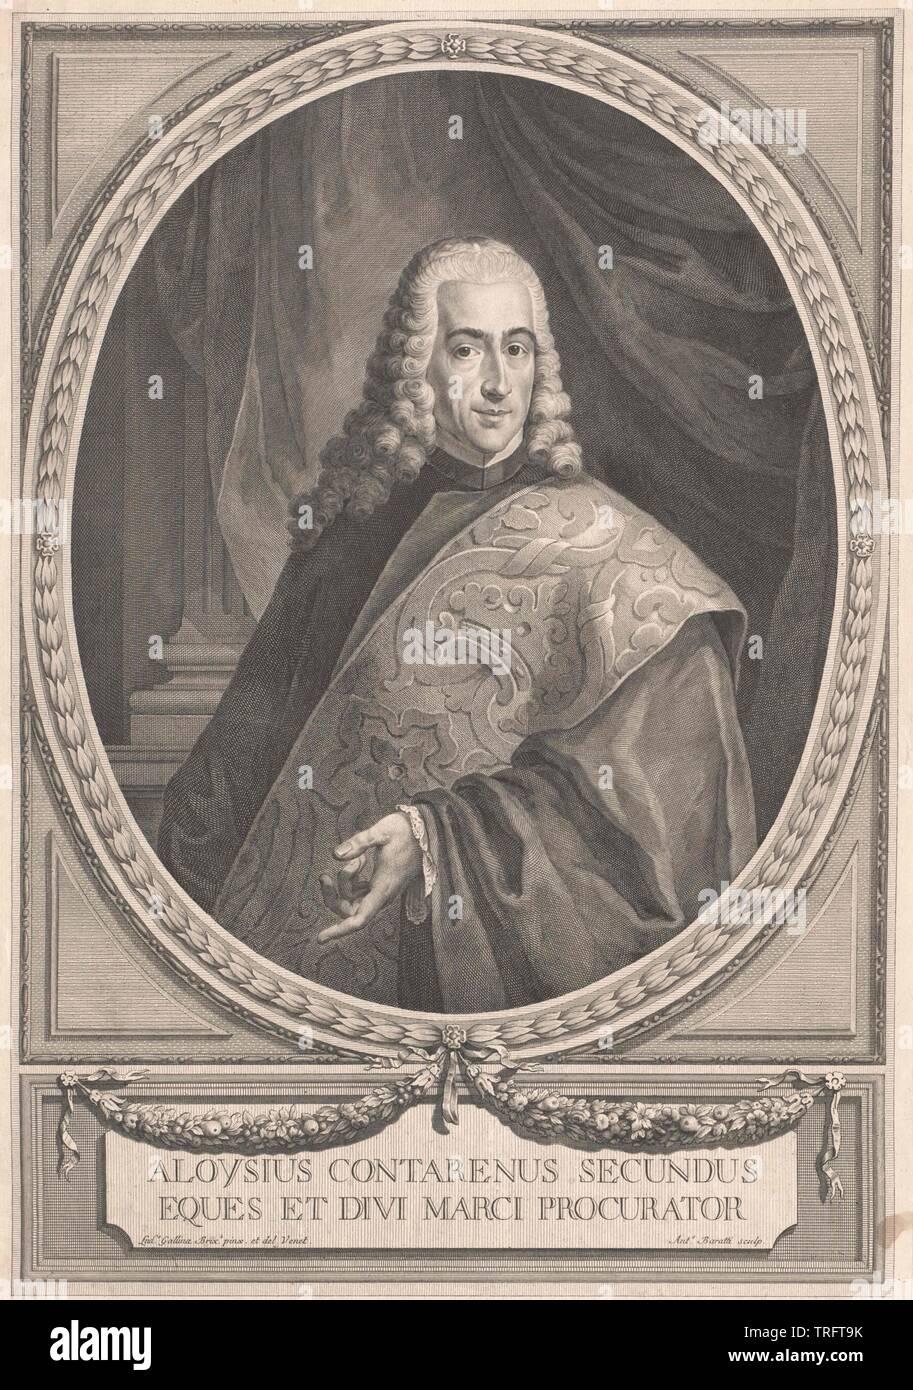 Contarini, Aloysius, lebte 2. H. aus dem 17. Jahrhundert, Additional-Rights - Clearance-Info - Not-Available Stockfoto